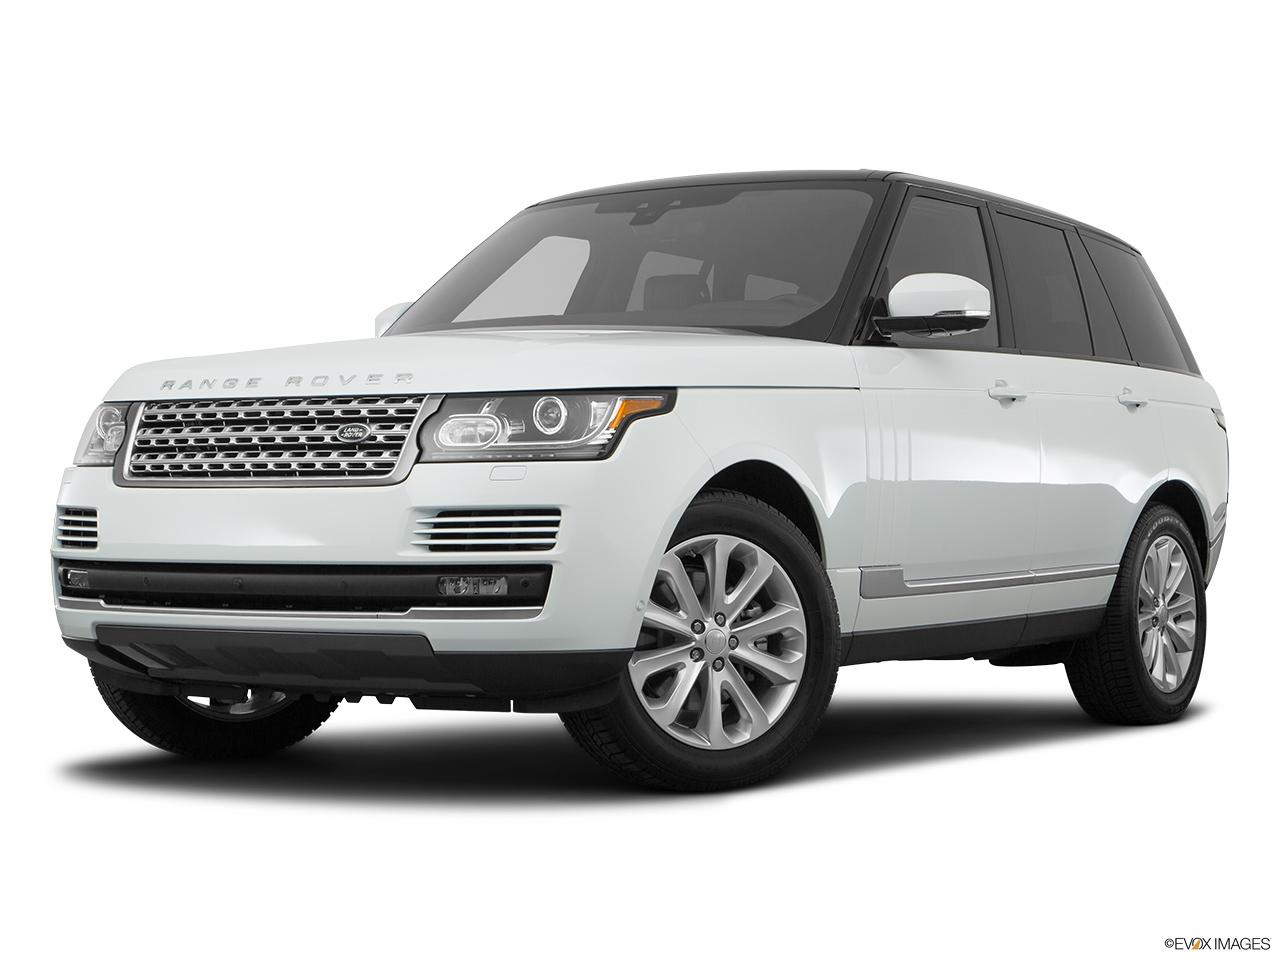 Lease A 2018 Land Rover Range Rover S Wheelbase Automatic